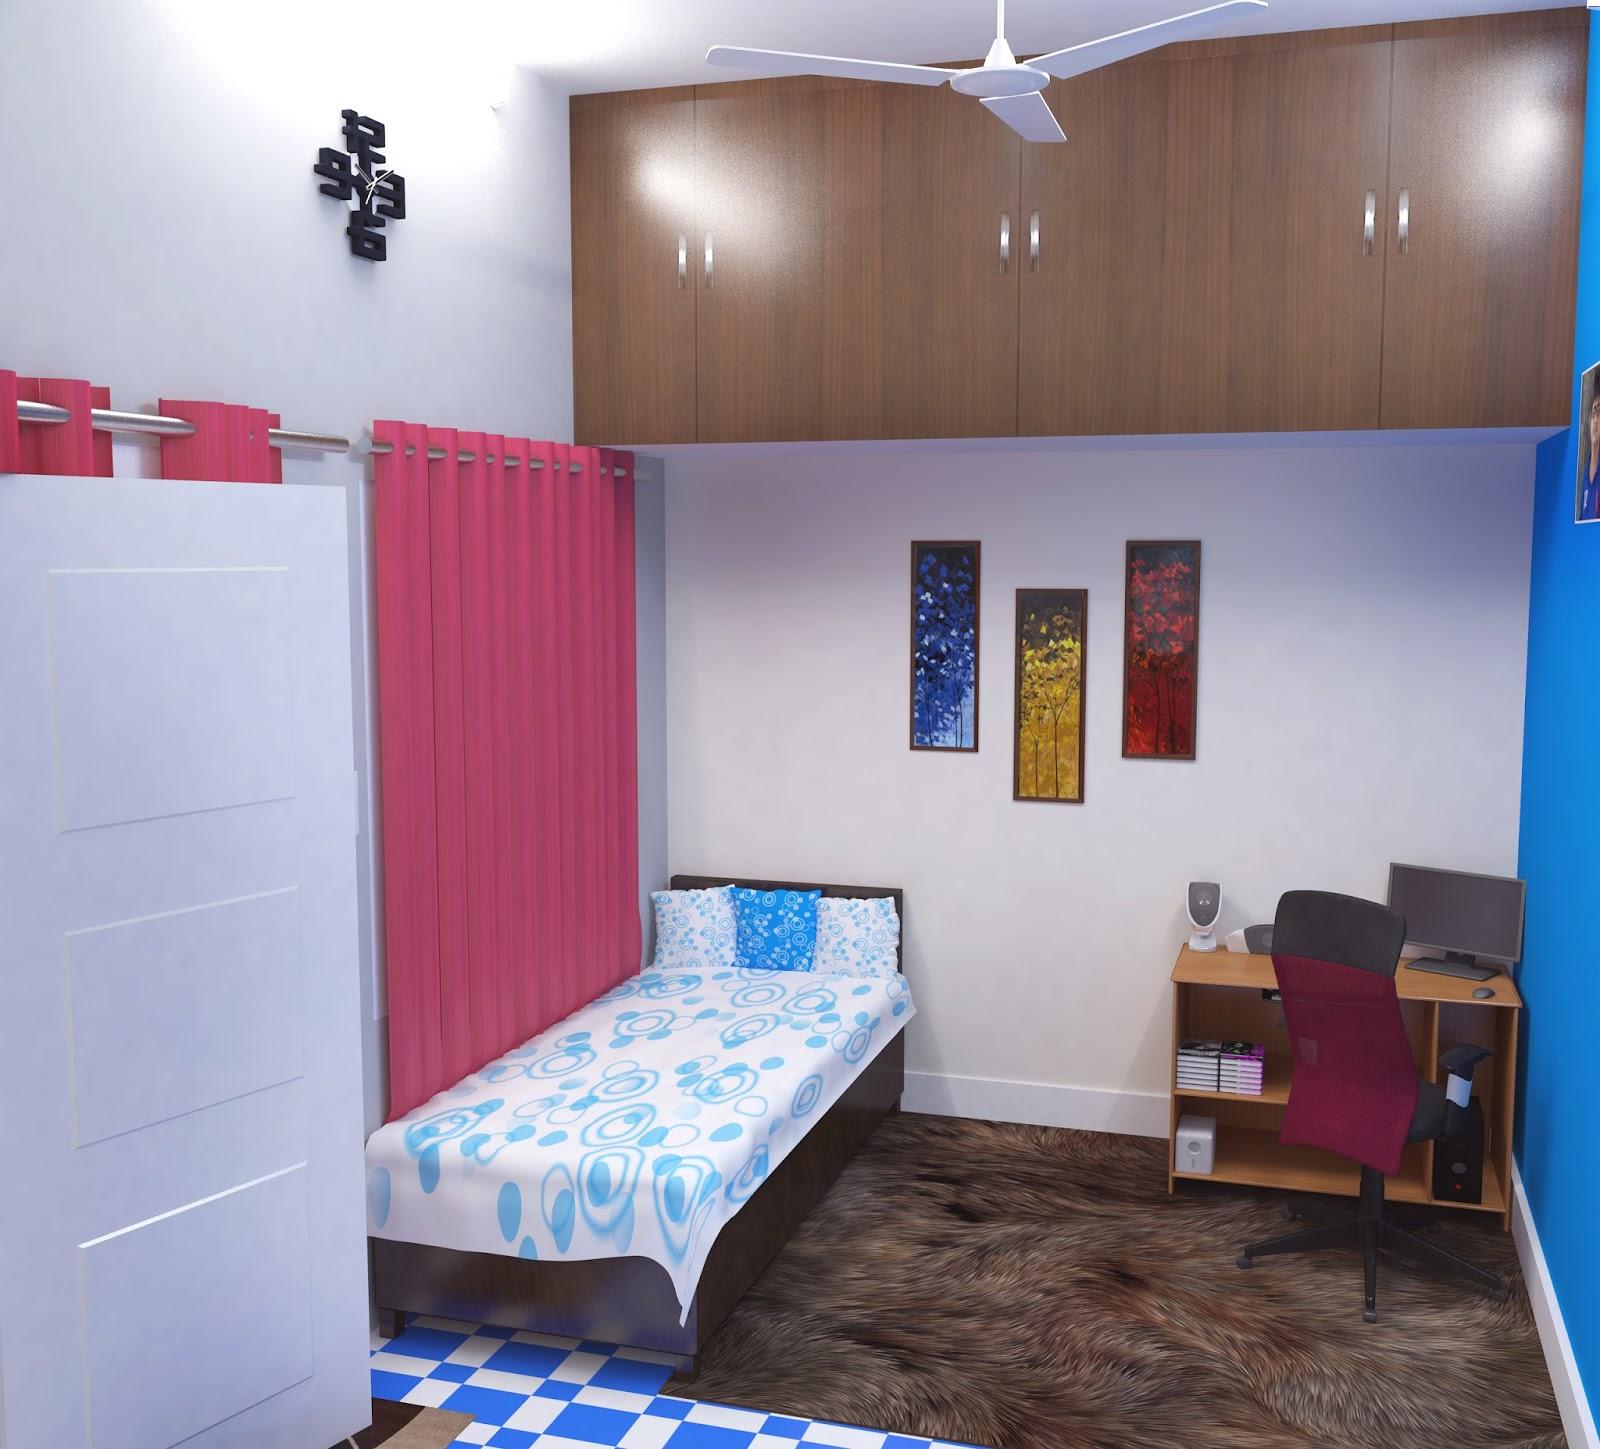 Wahid Choudhary 3d Designer